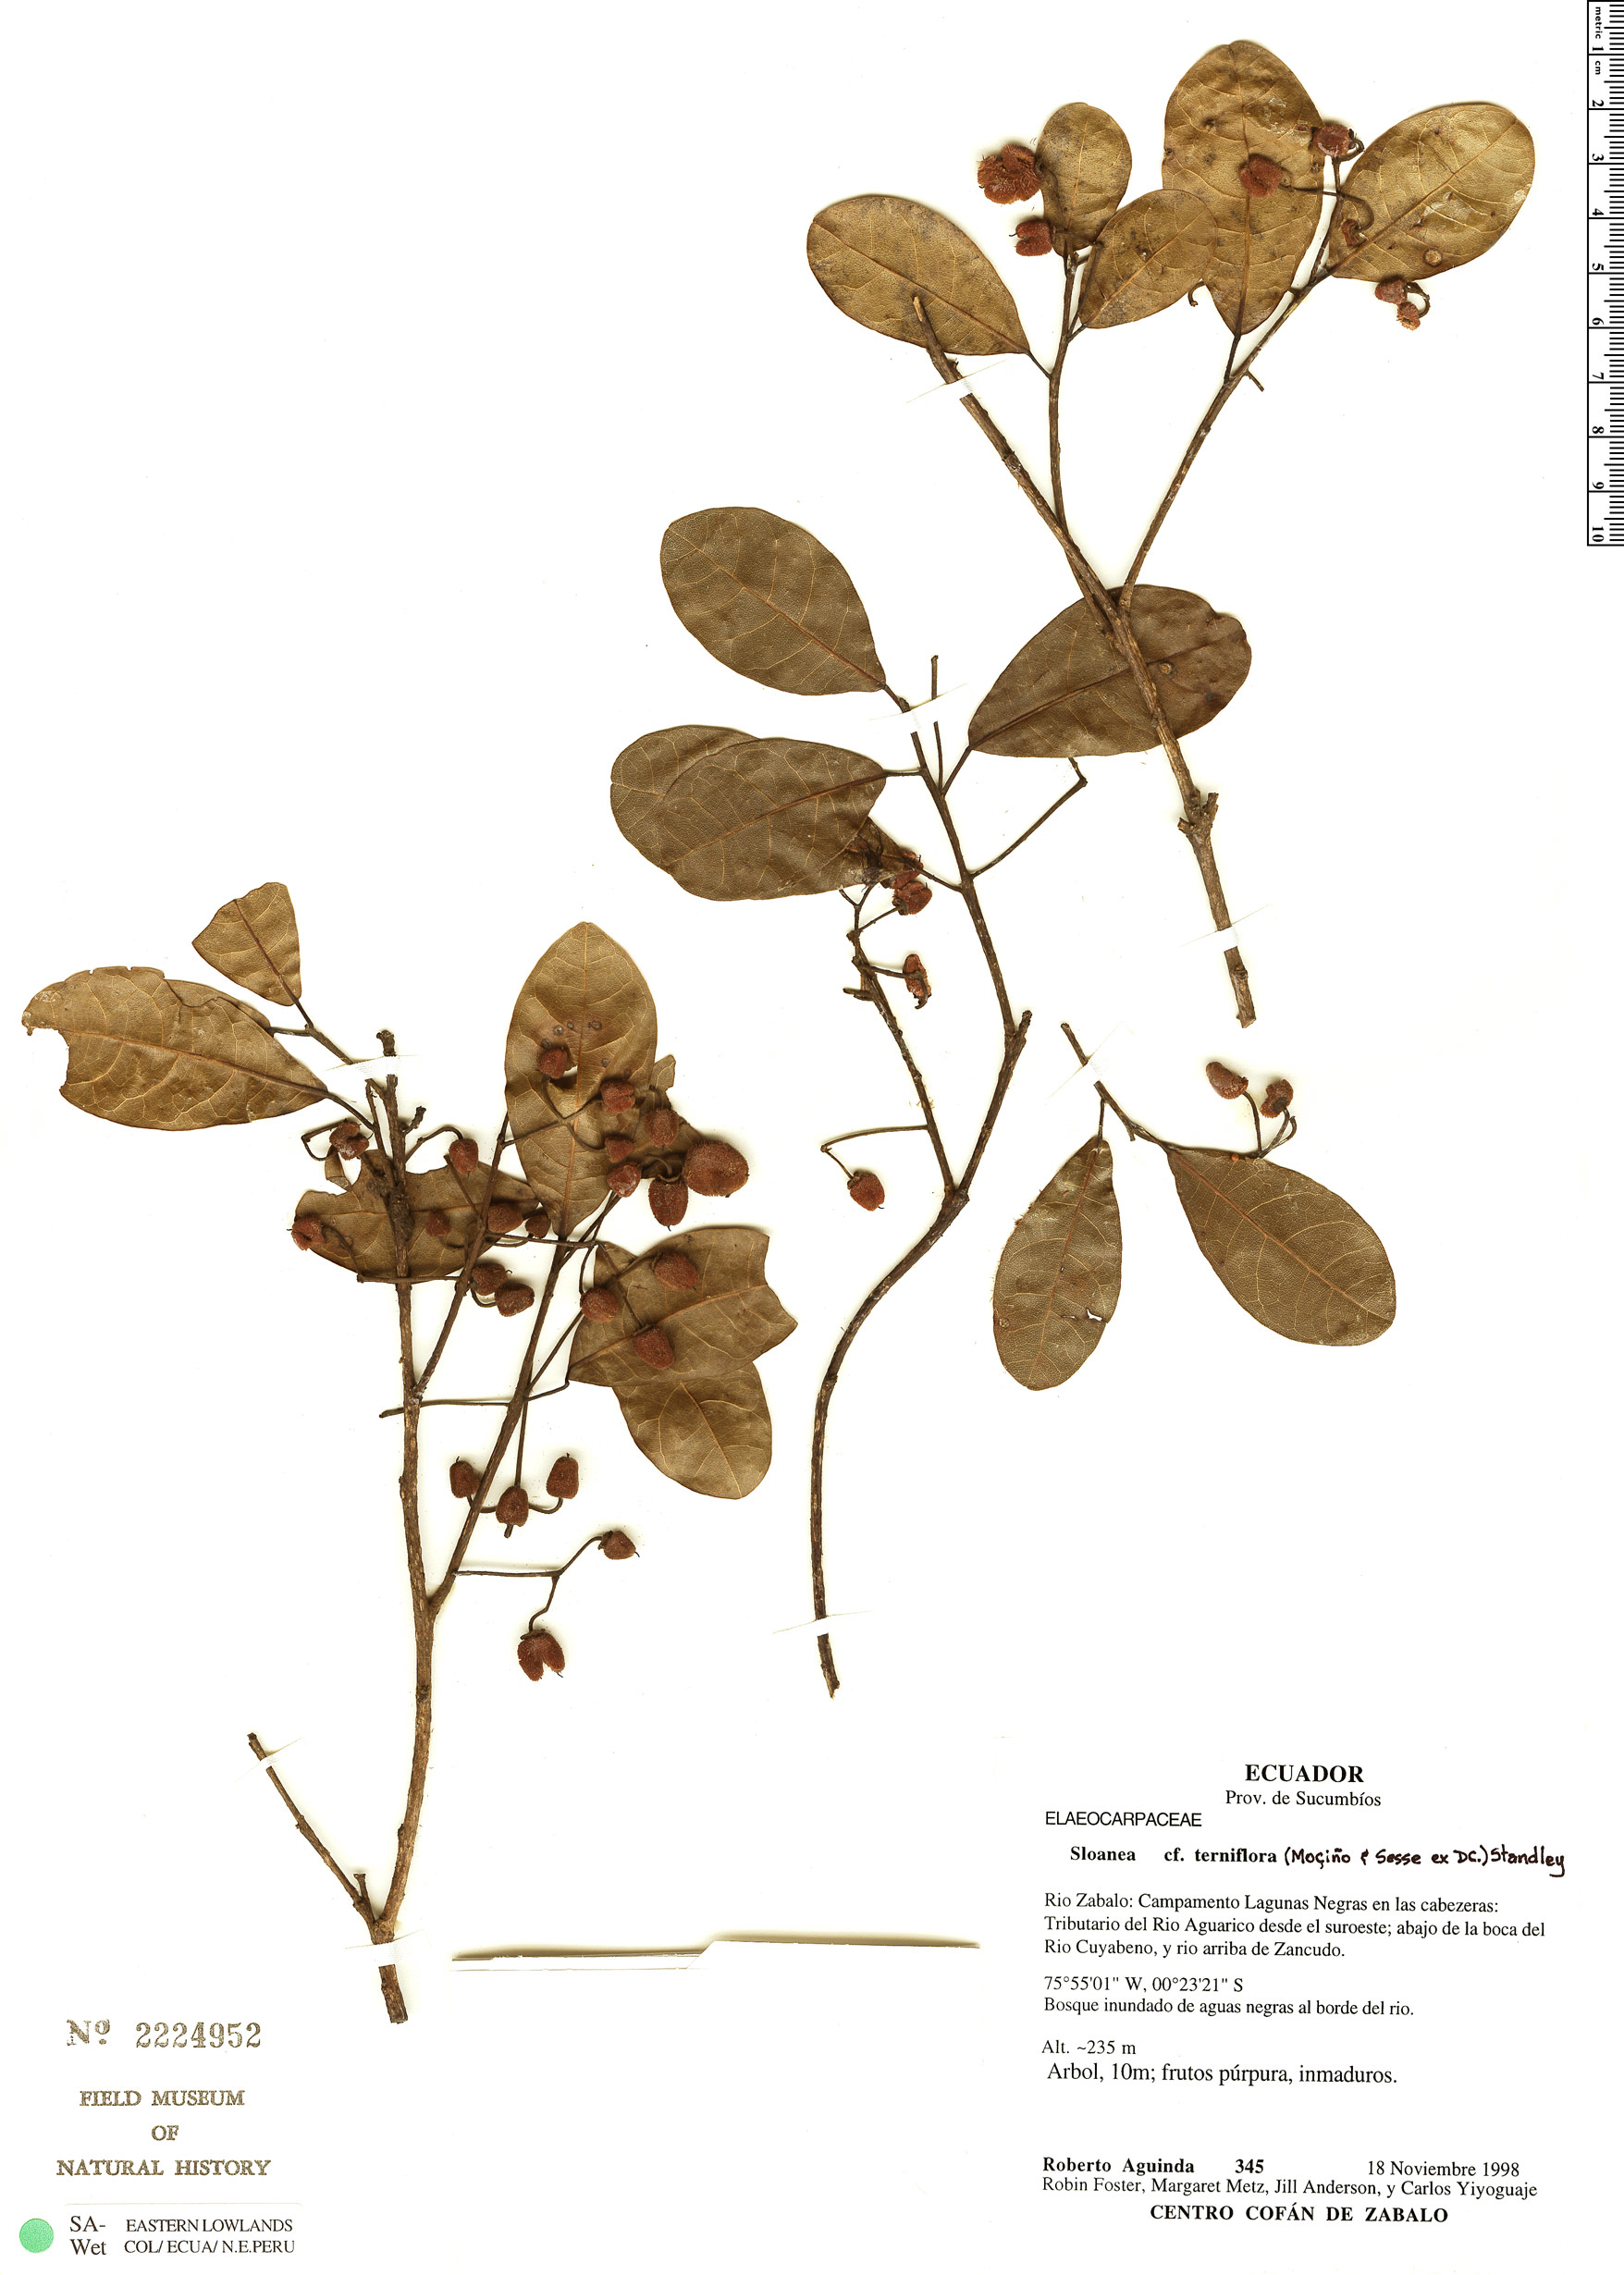 Specimen: Sloanea terniflora